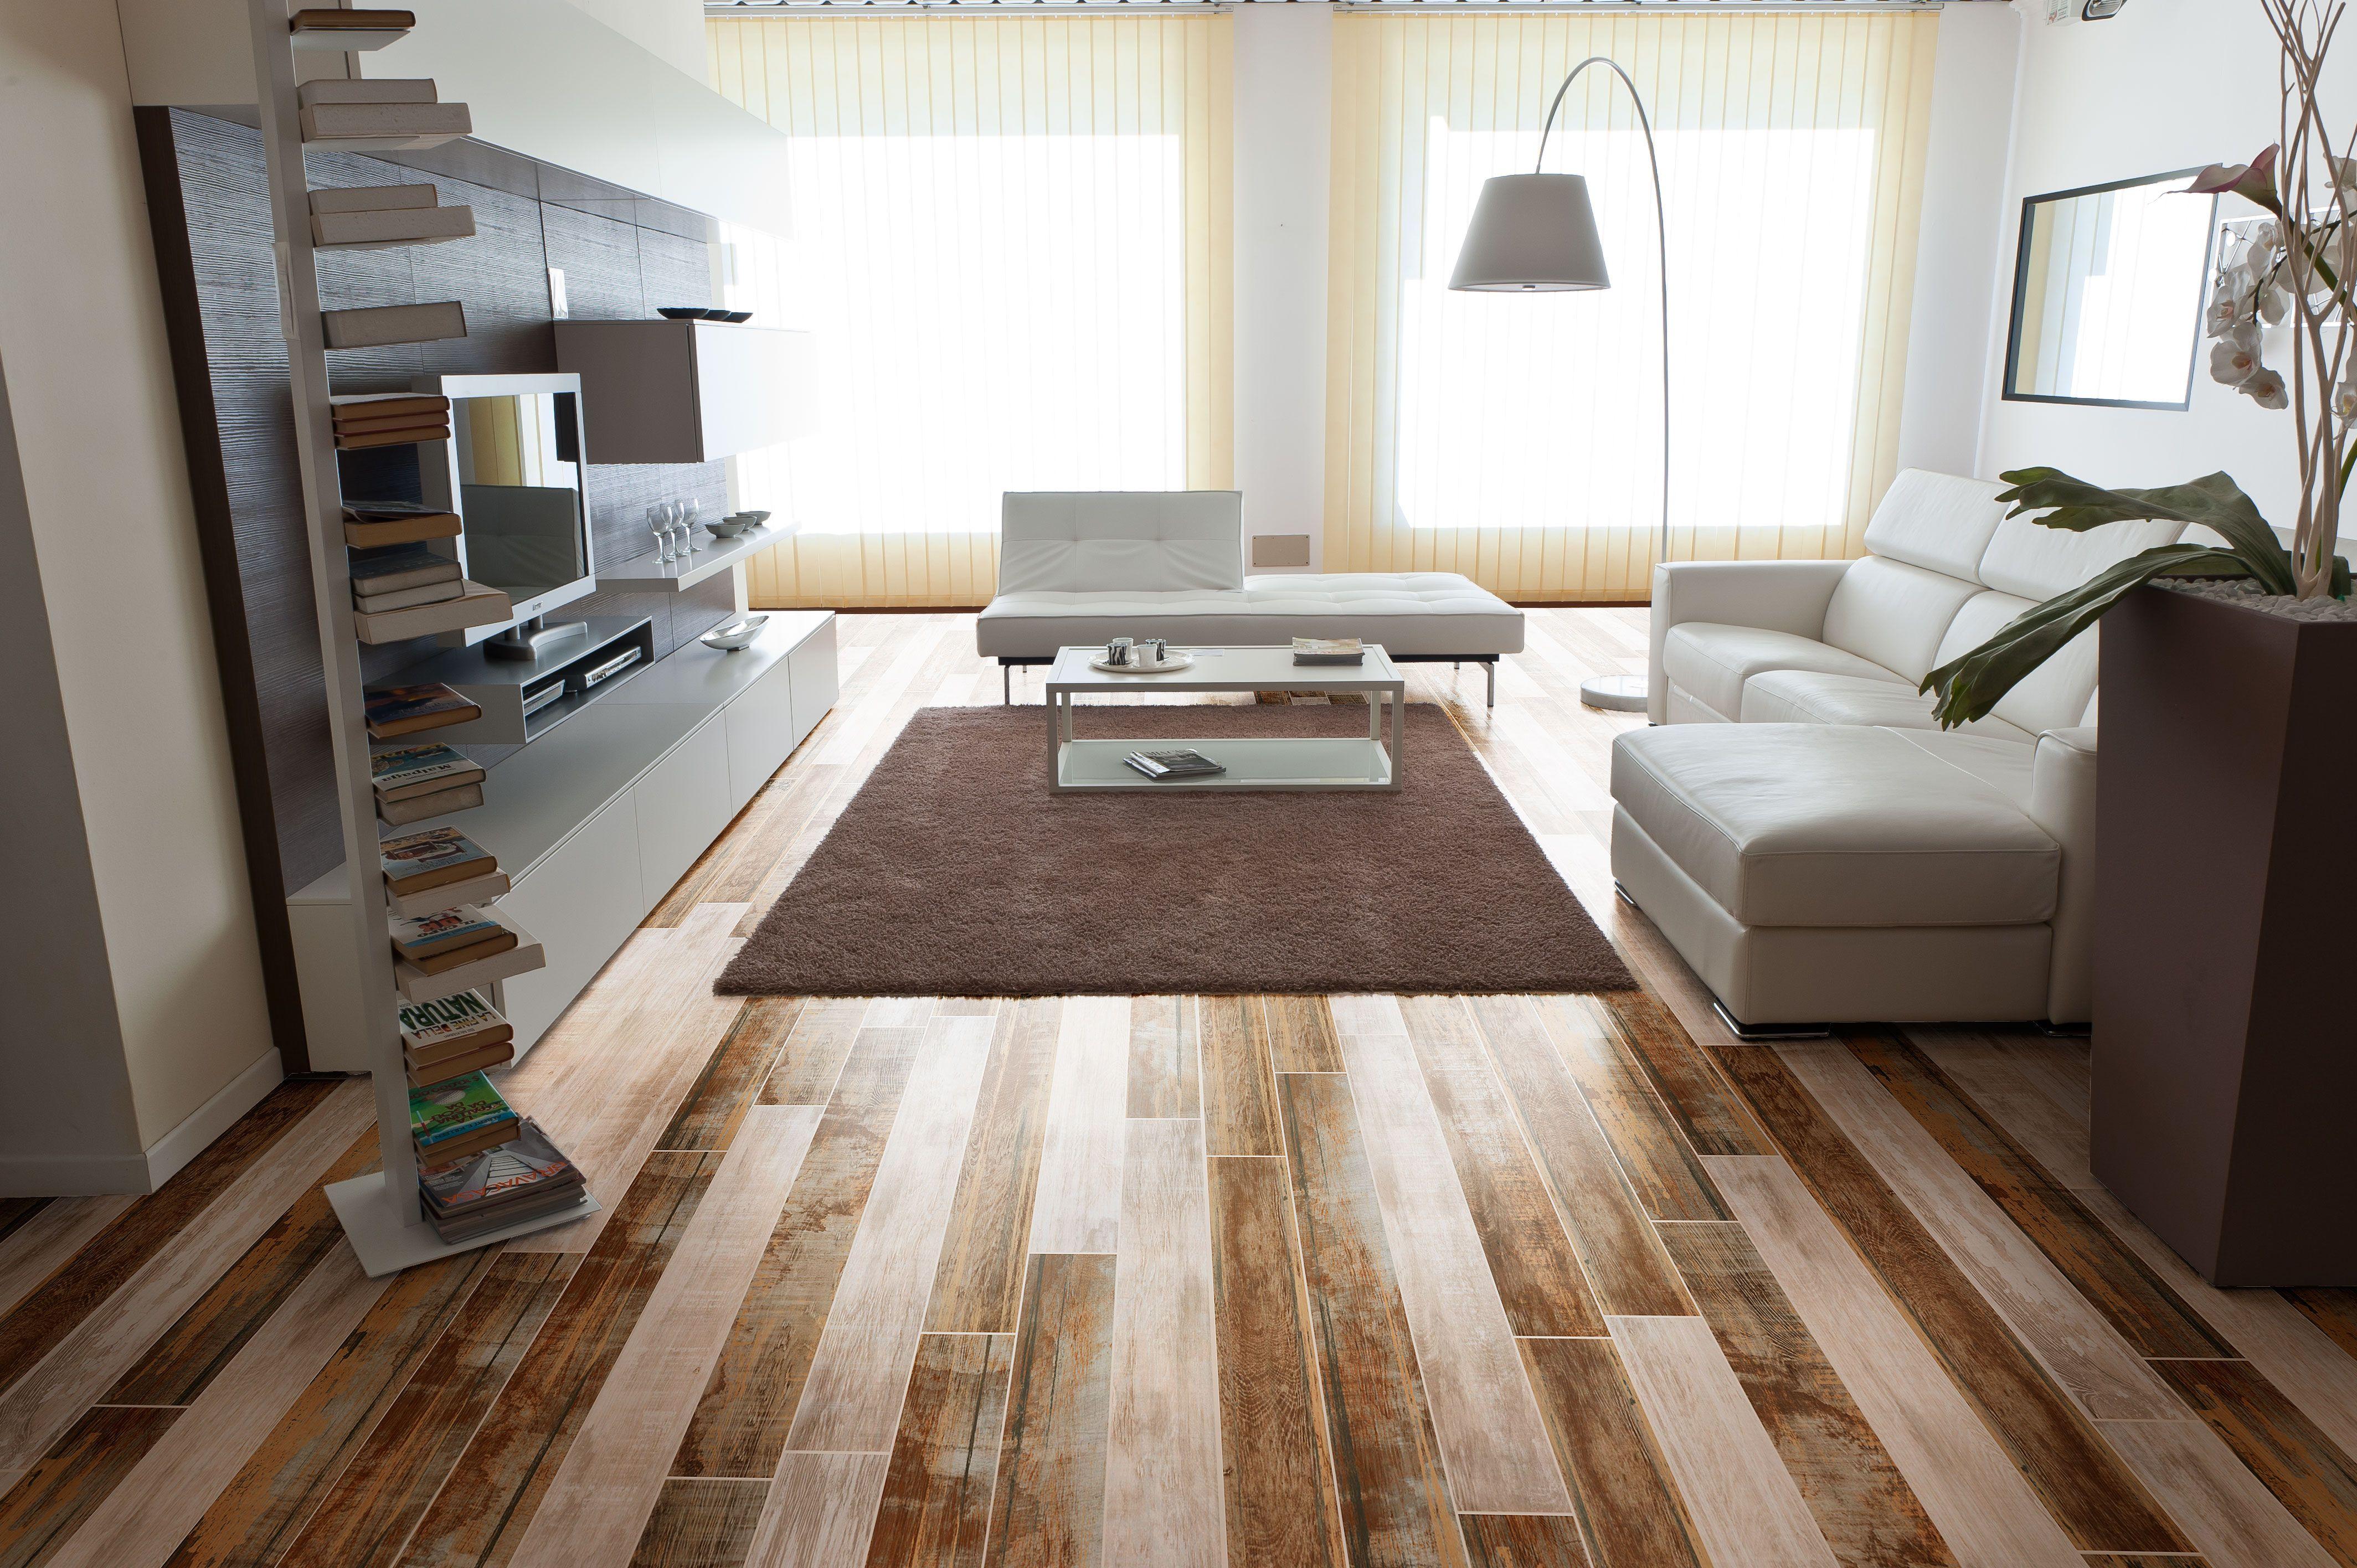 carrelage tendance bois urban forest vm carrelage am nagement s jour pinterest. Black Bedroom Furniture Sets. Home Design Ideas